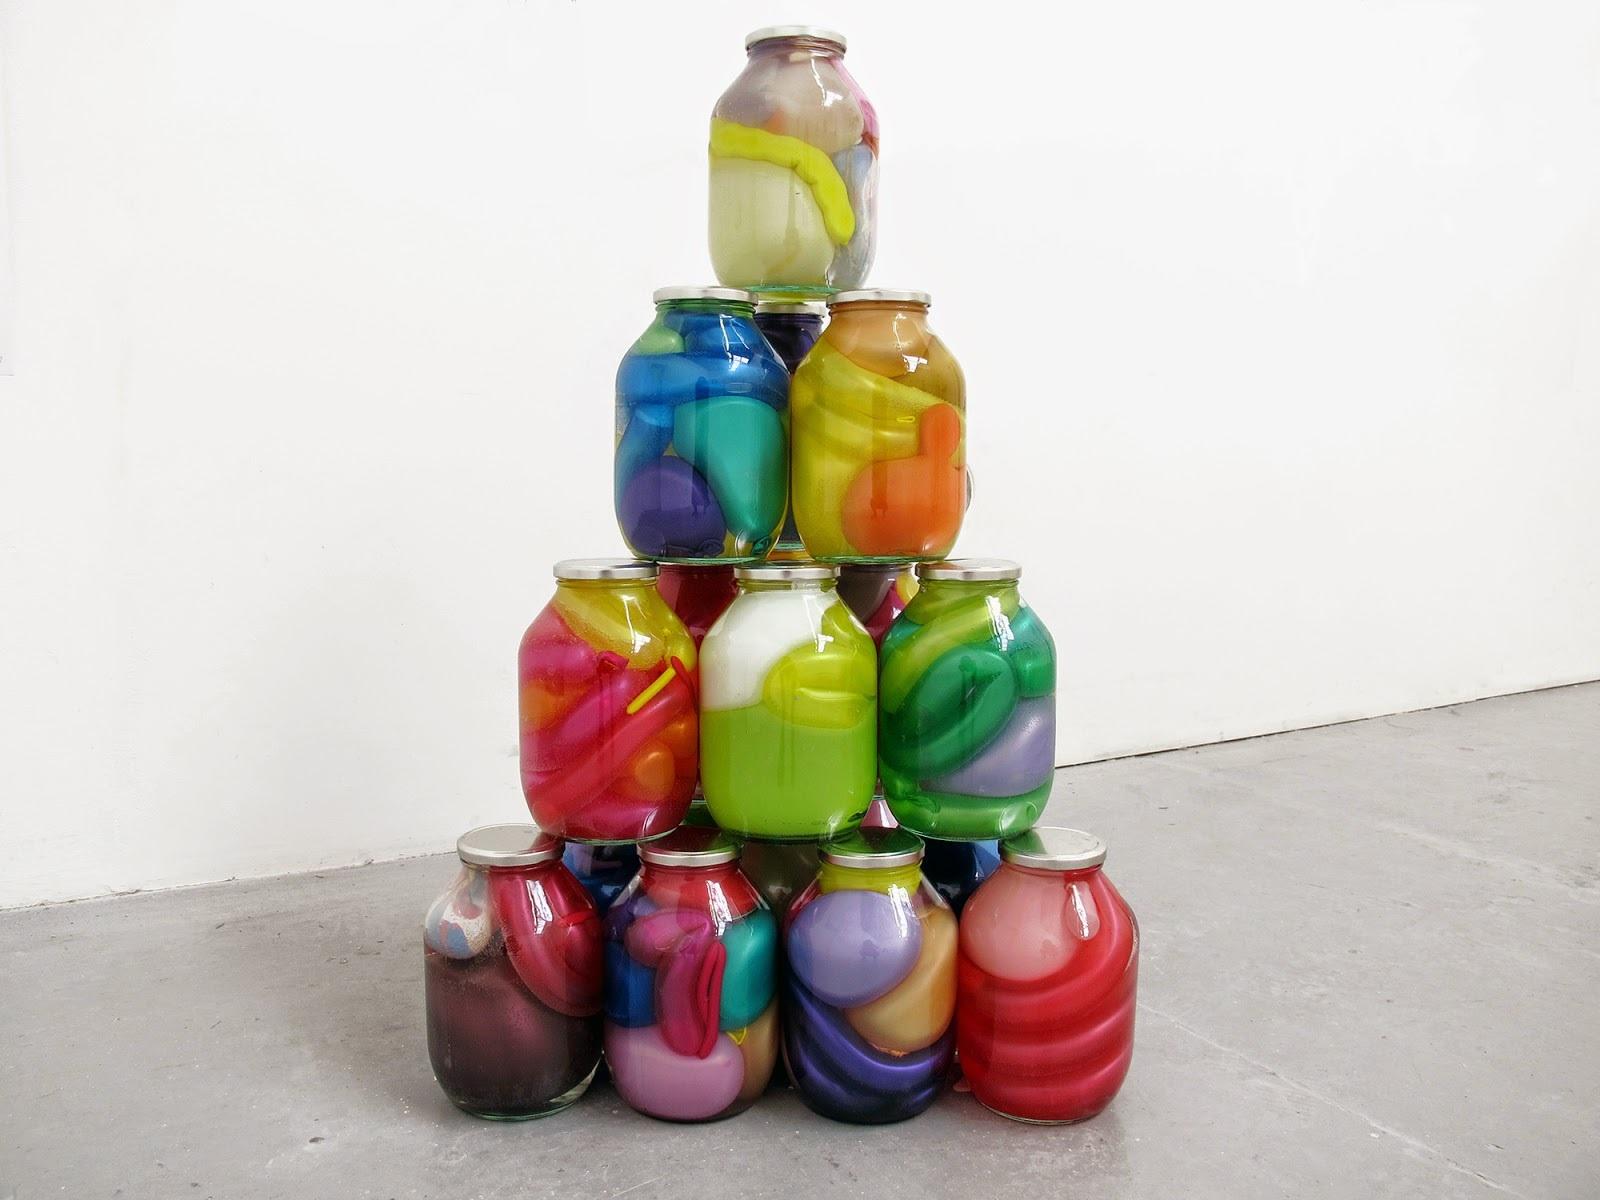 Saelia Aparicio, Pickled Balloons